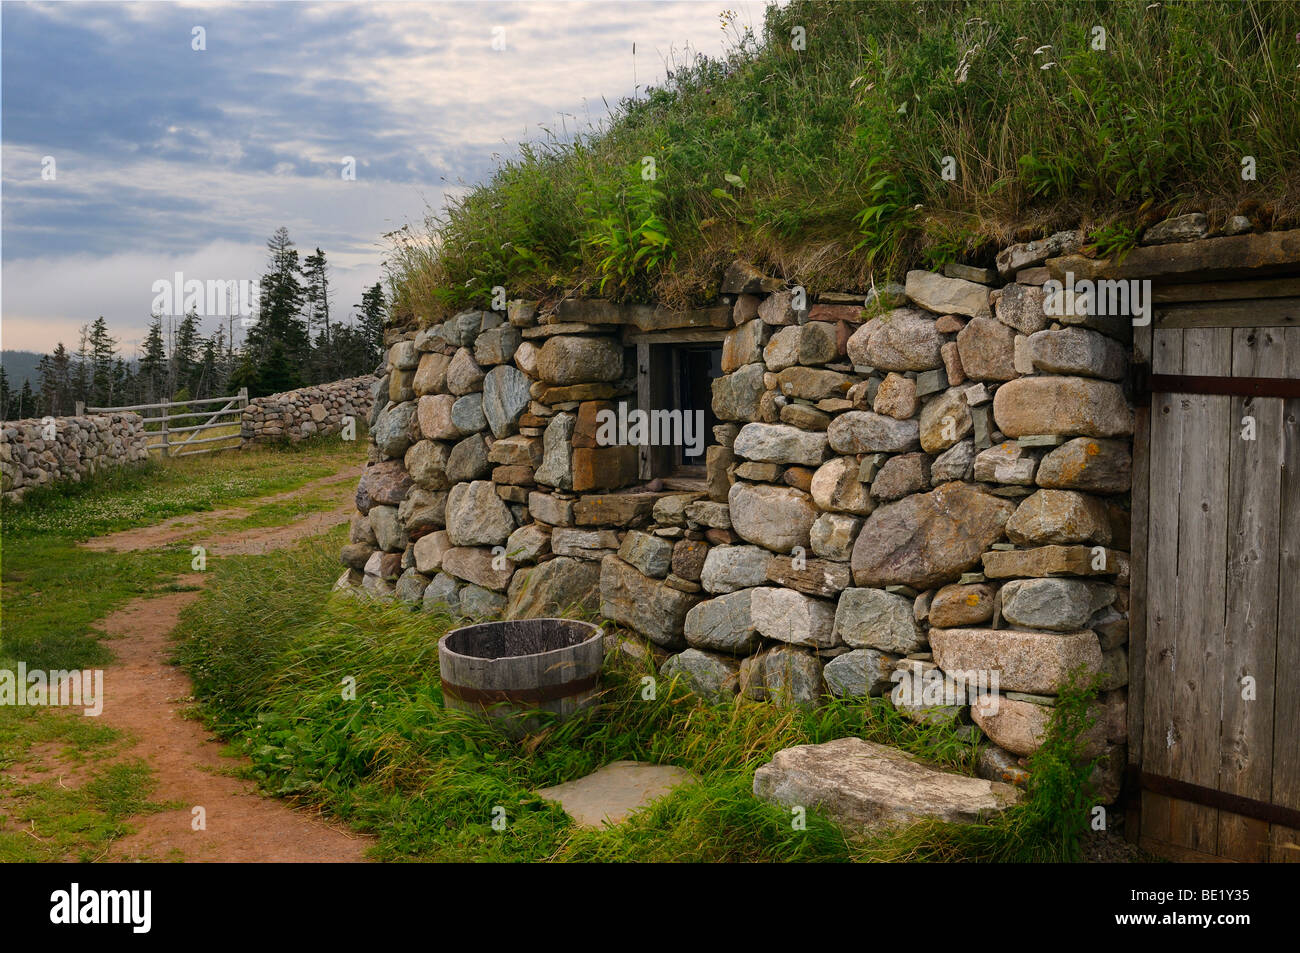 Gaelic Black House of stone with sod roof at Highland Village Museum Iona Cape Breton Island Nova Scotia Canada - Stock Image